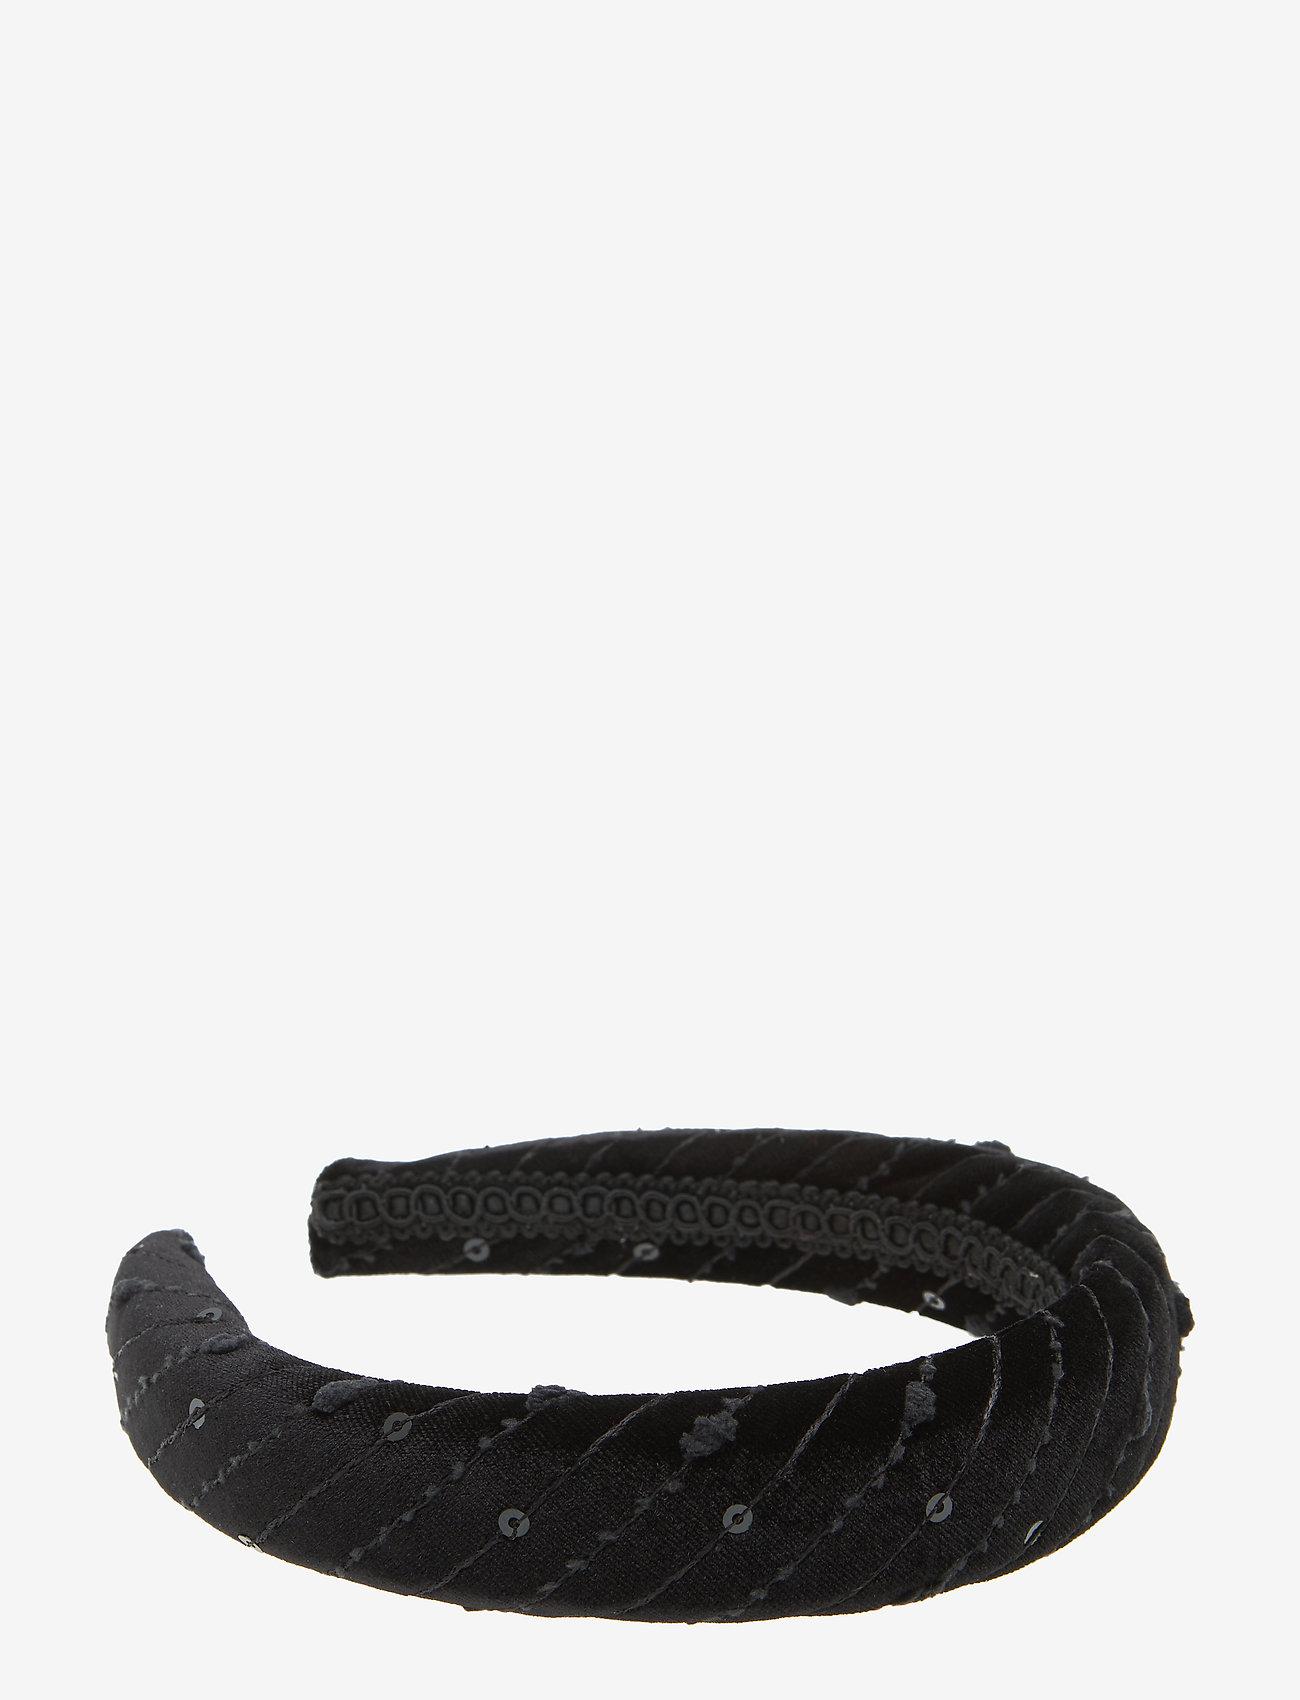 PIPOL'S BAZAAR - Kiara Diadema Velvet Black B - hair accessories - black - 0